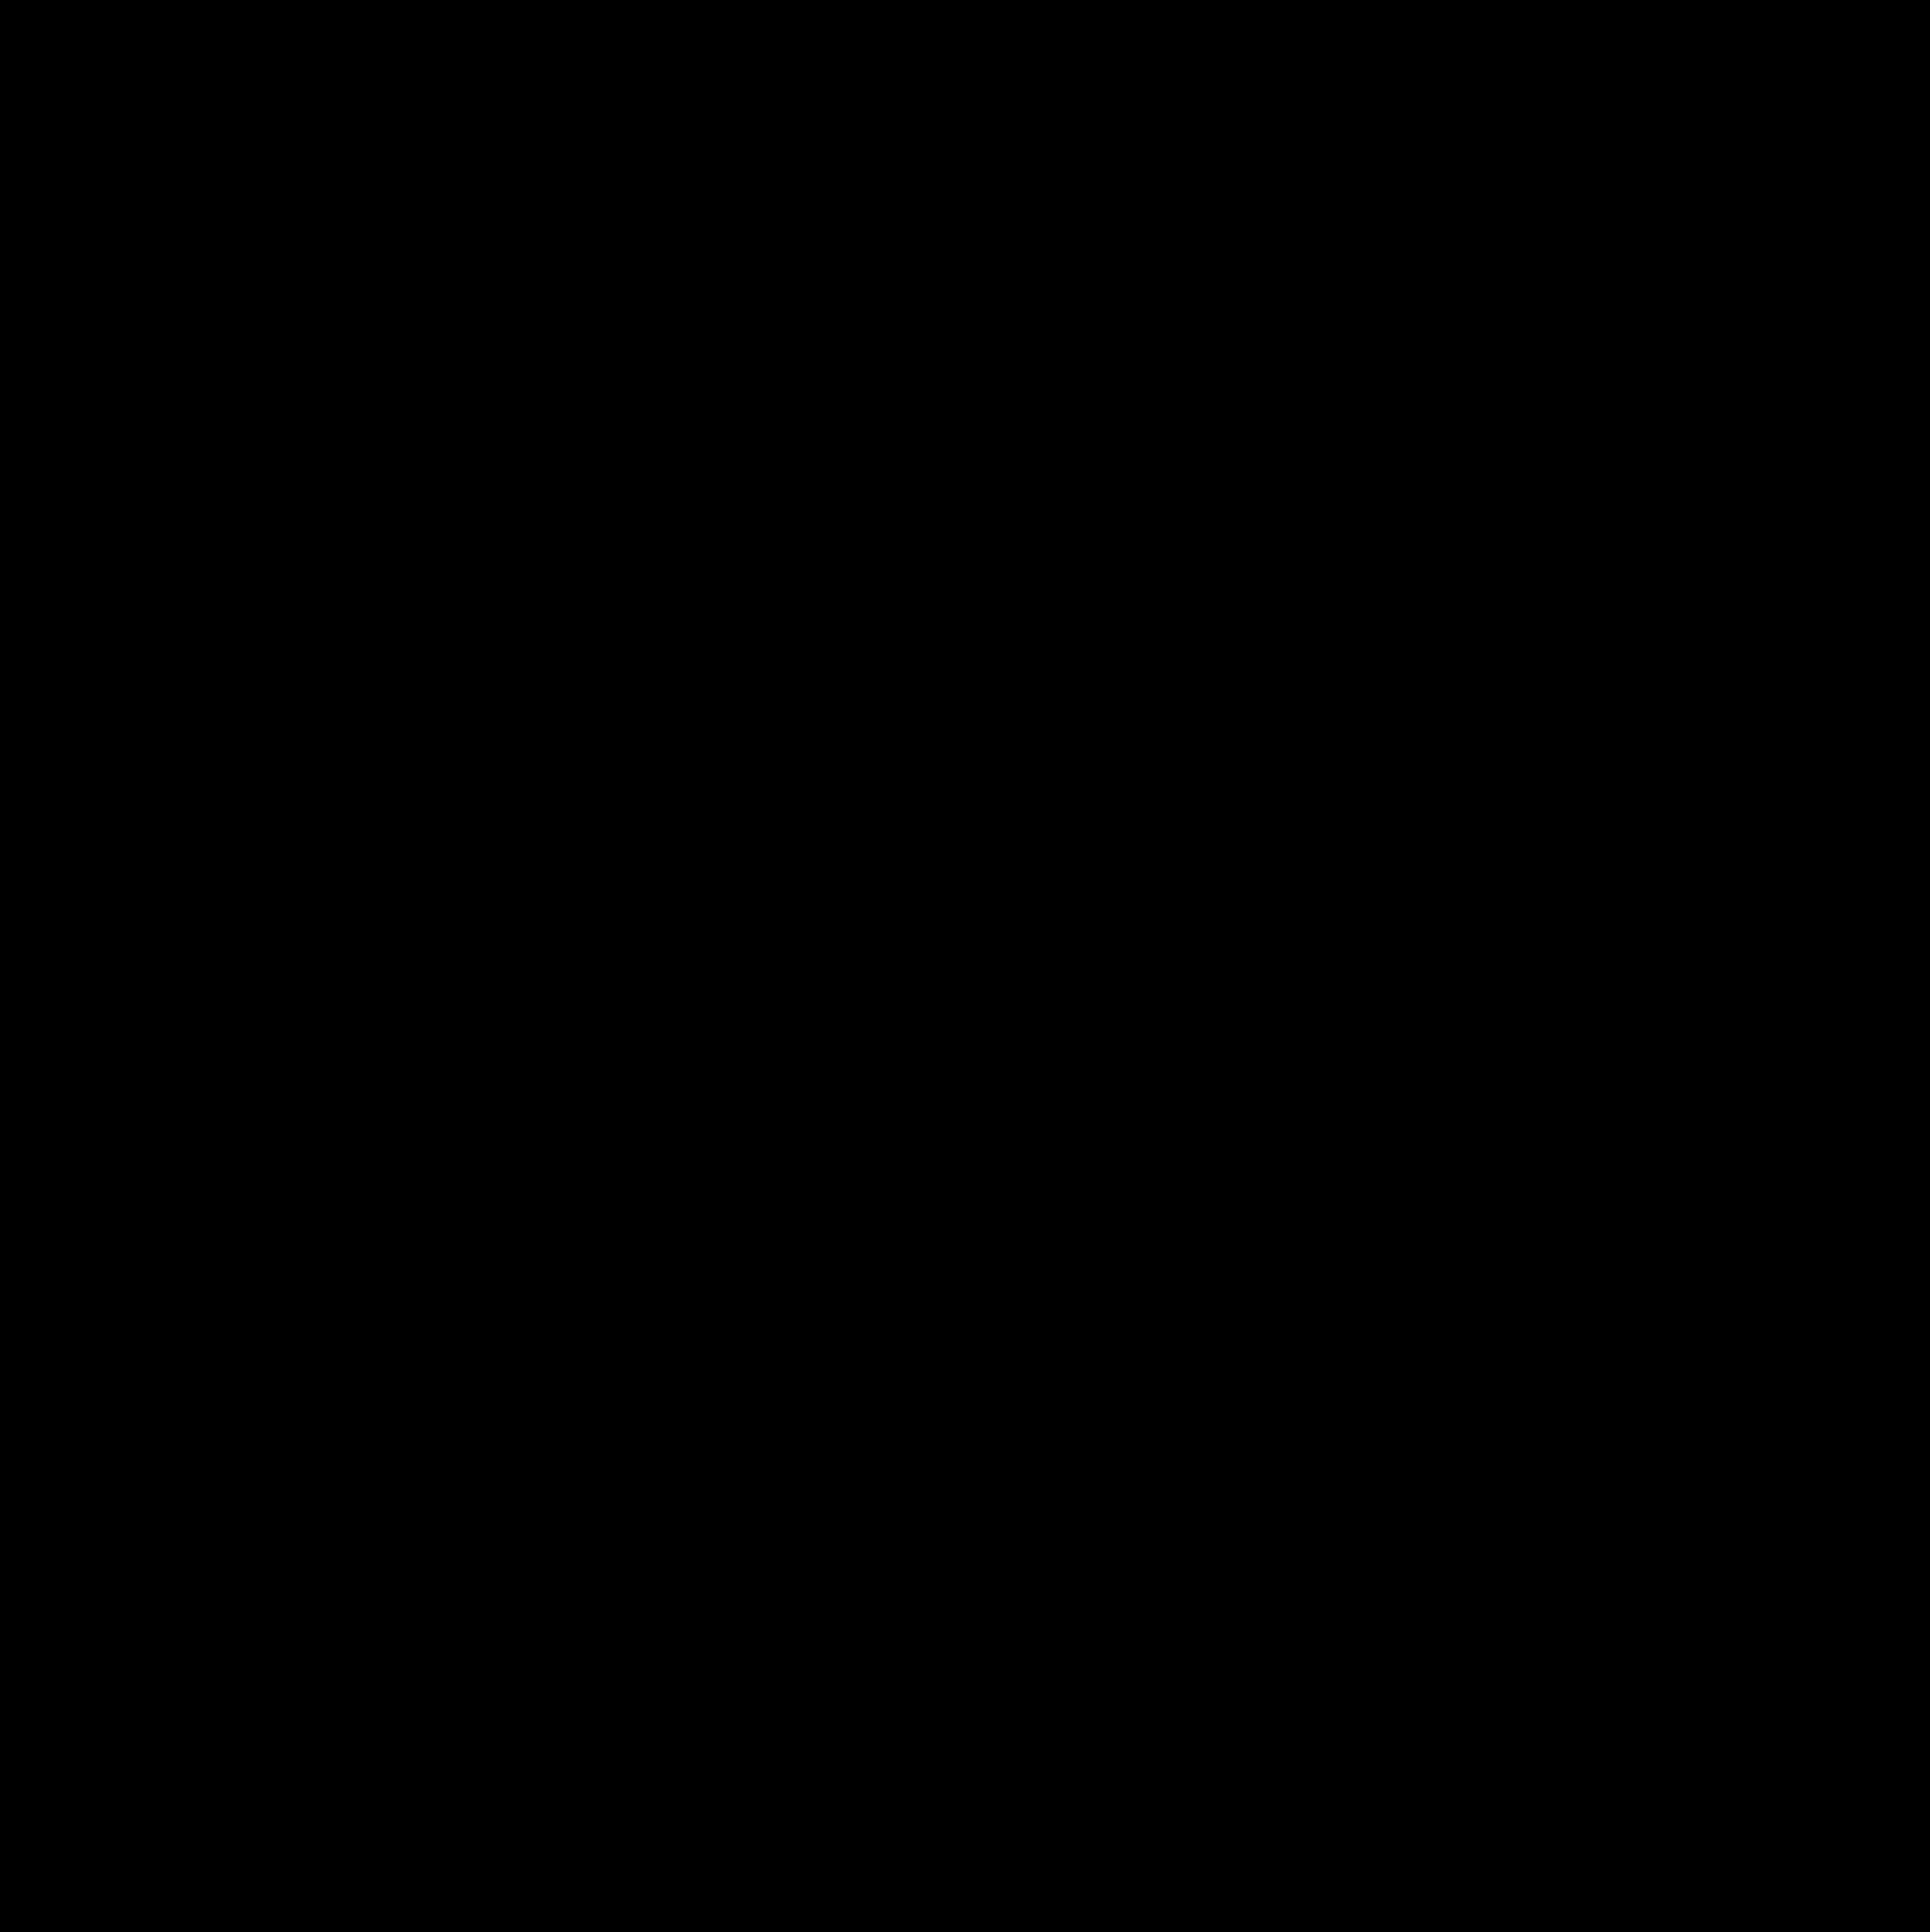 Go Board 19x19 Printable Board Game